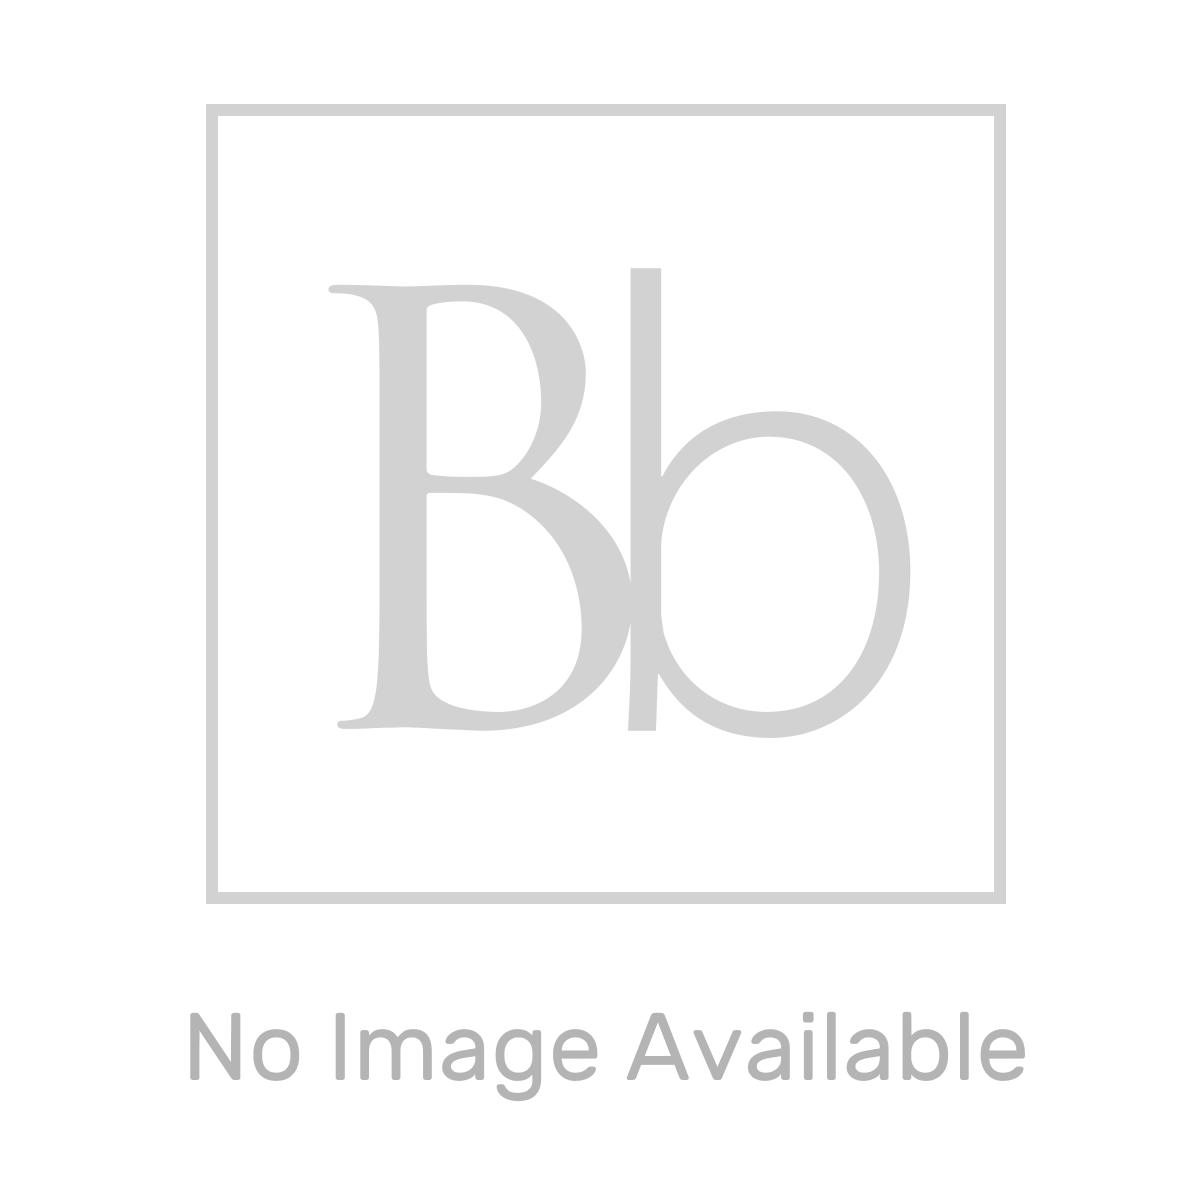 Stuart Turner 46530 PH 45 TS FL Automatic Flow Pump